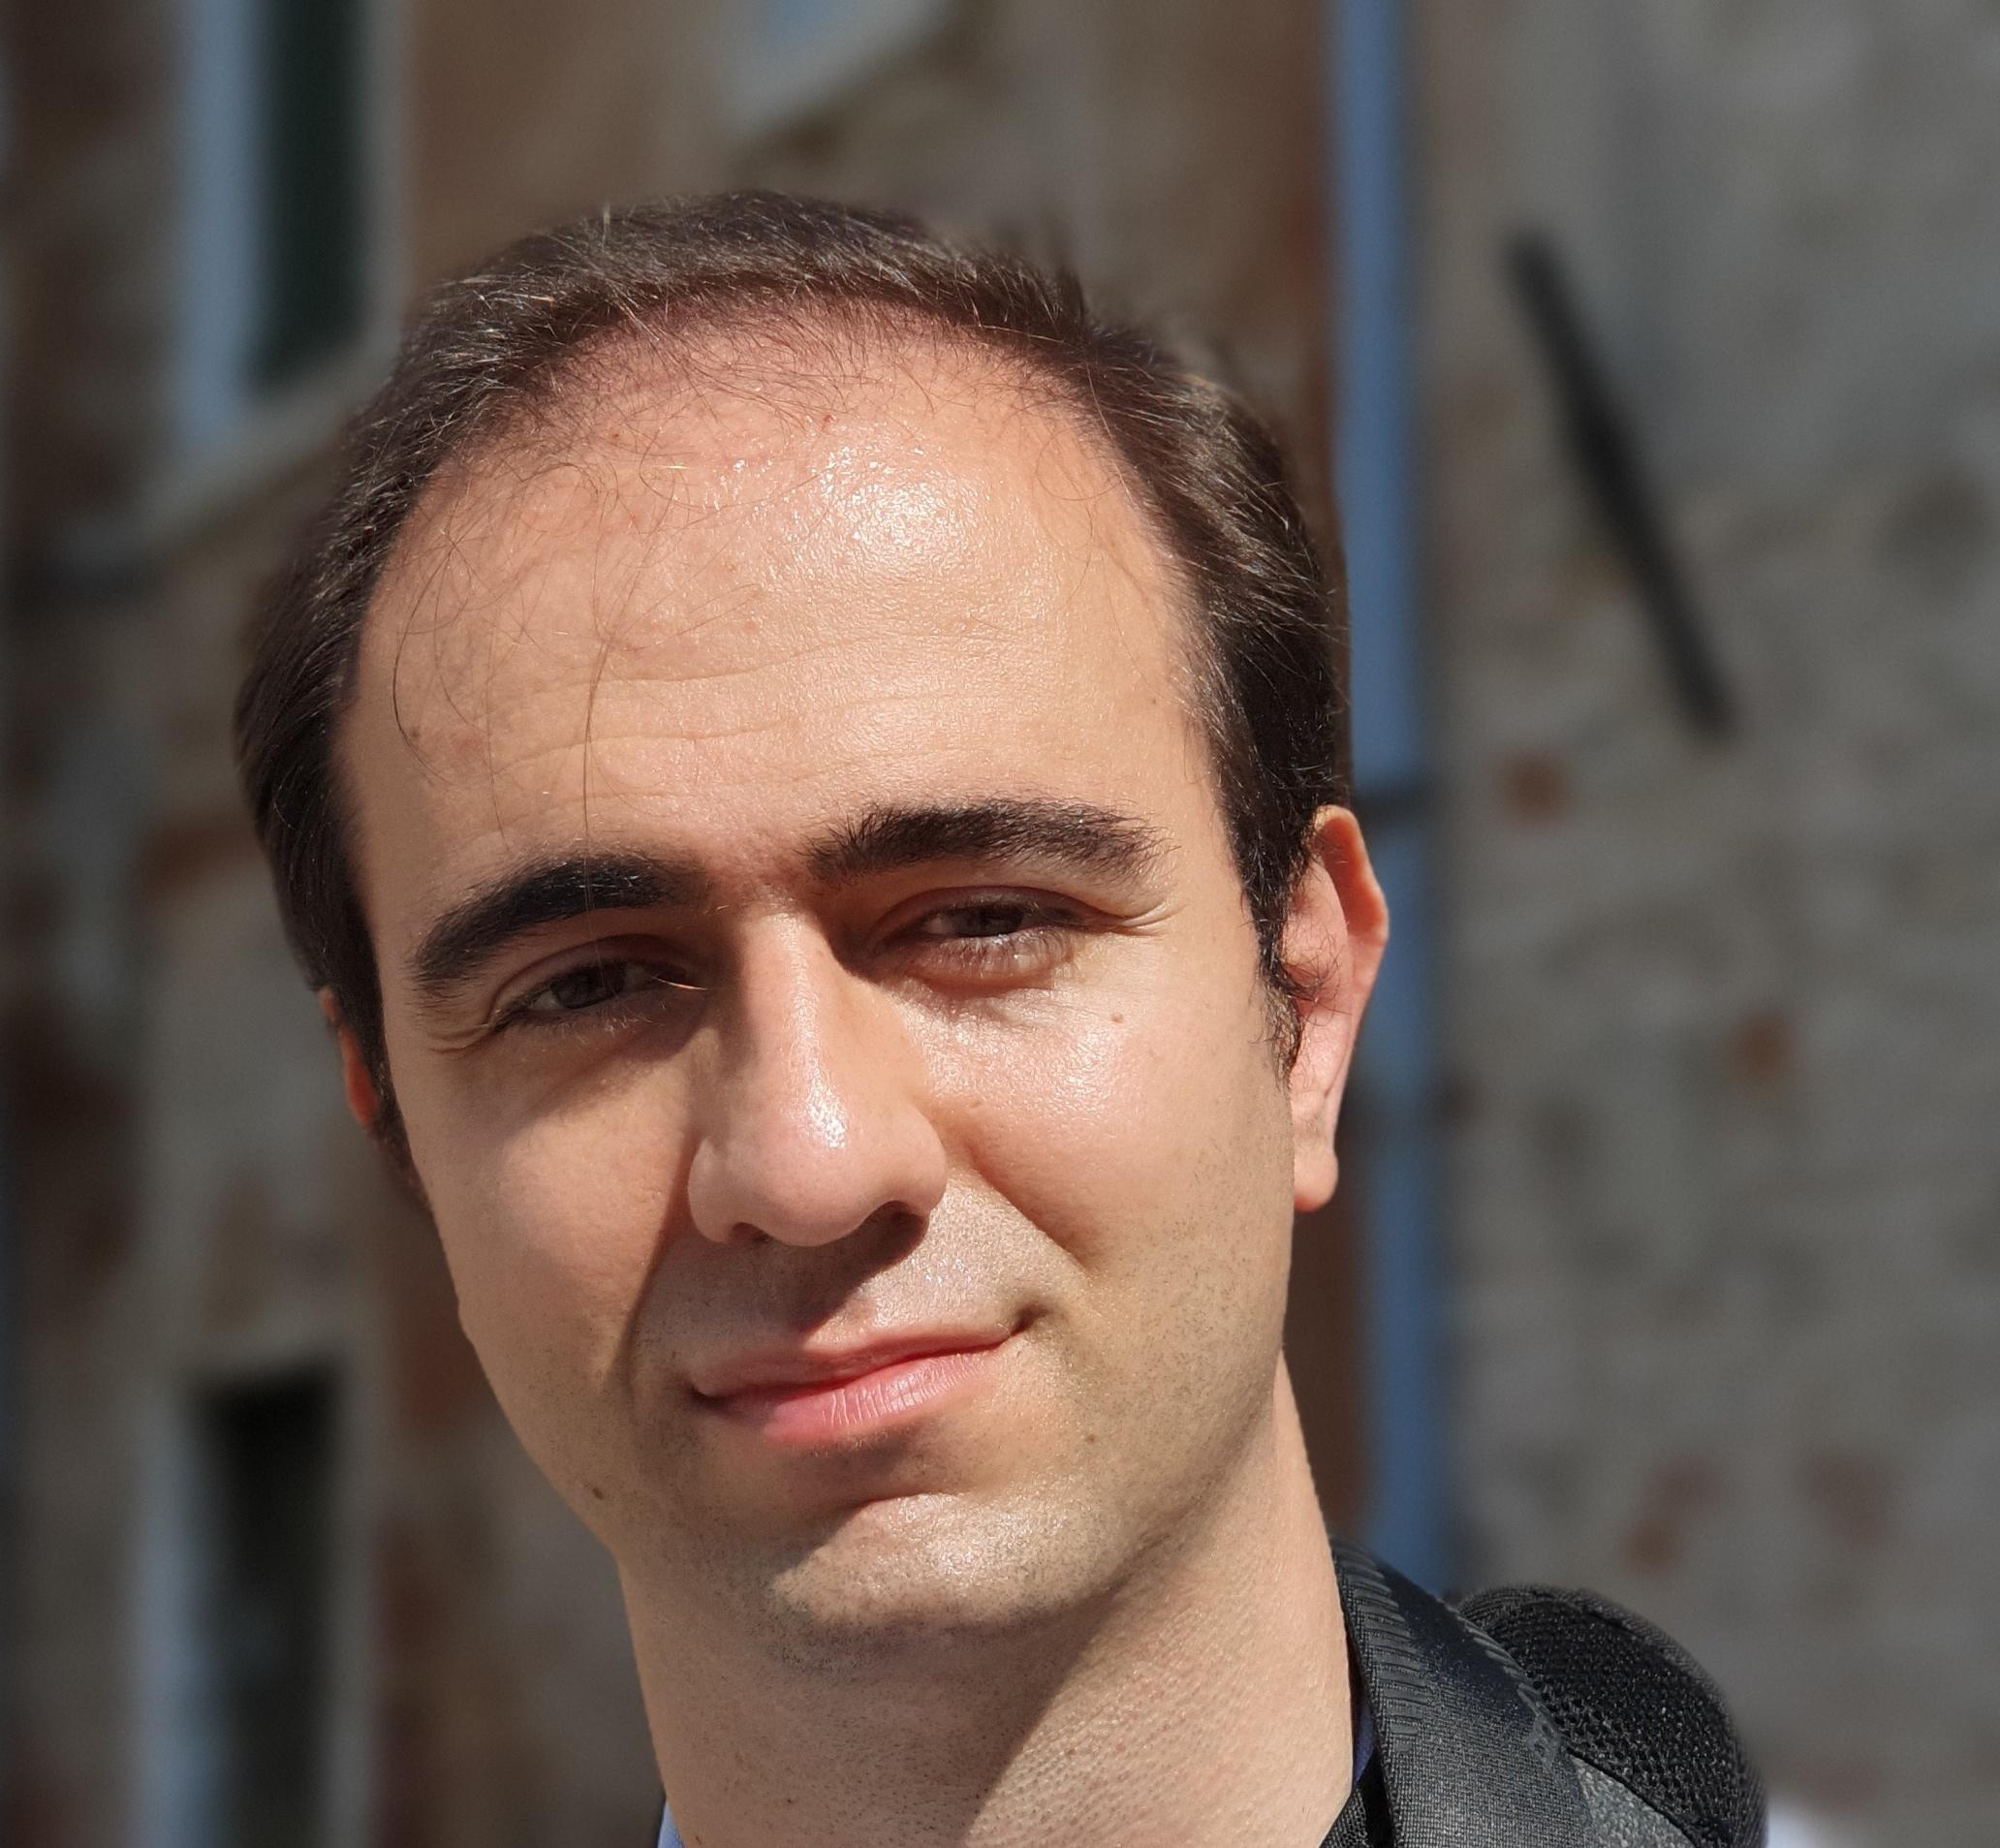 Emanuele Bagnaschi